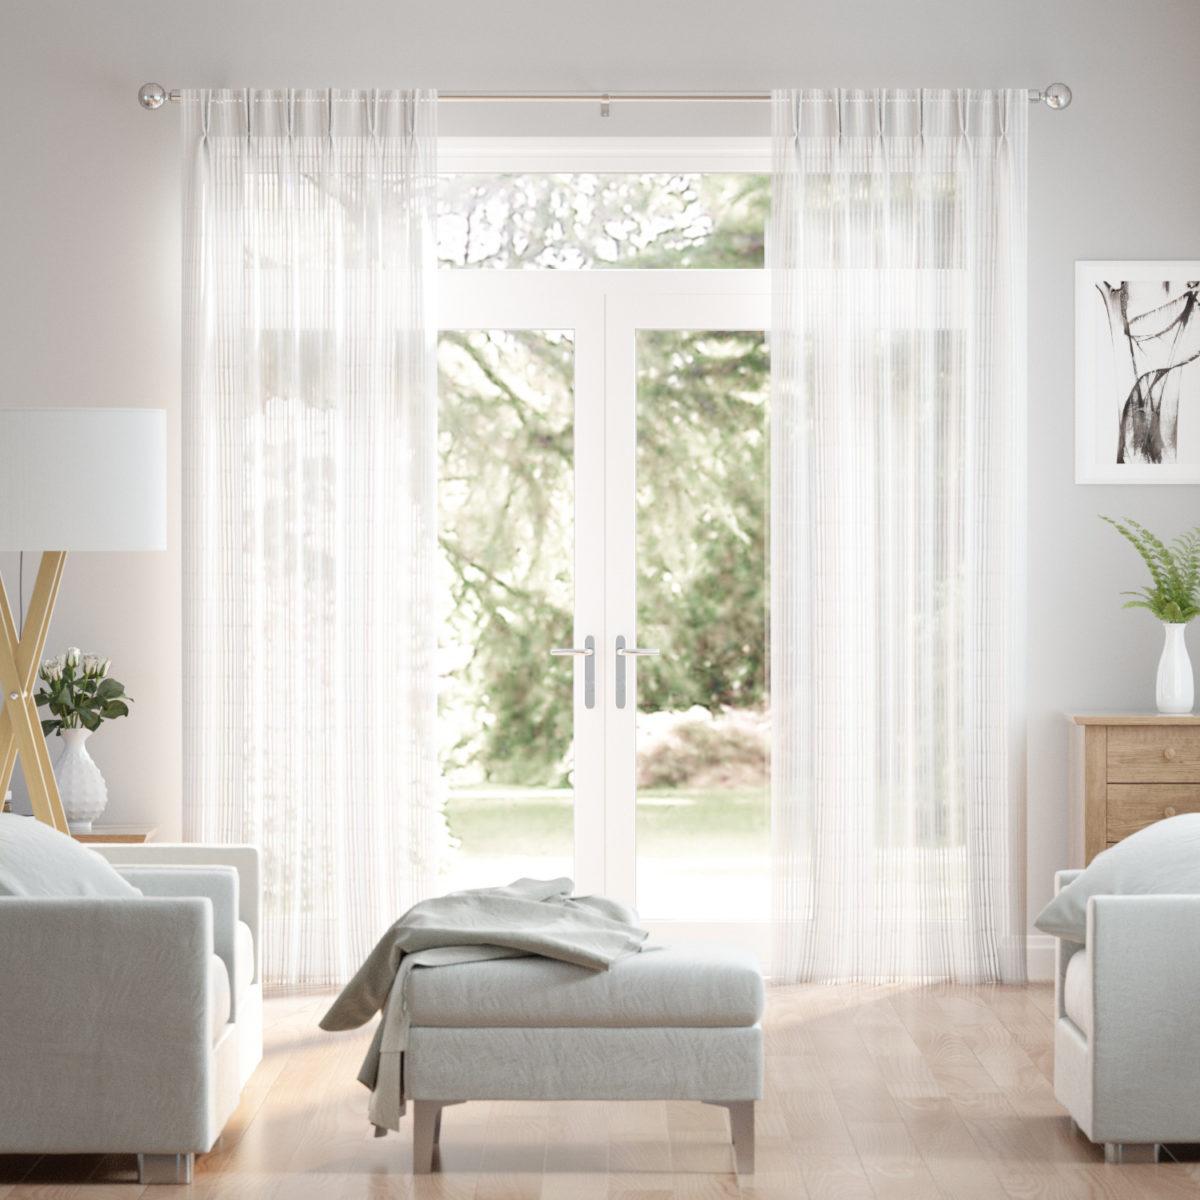 1serengeti-voile-ice-sheer-curtains-1200x1200.jpg